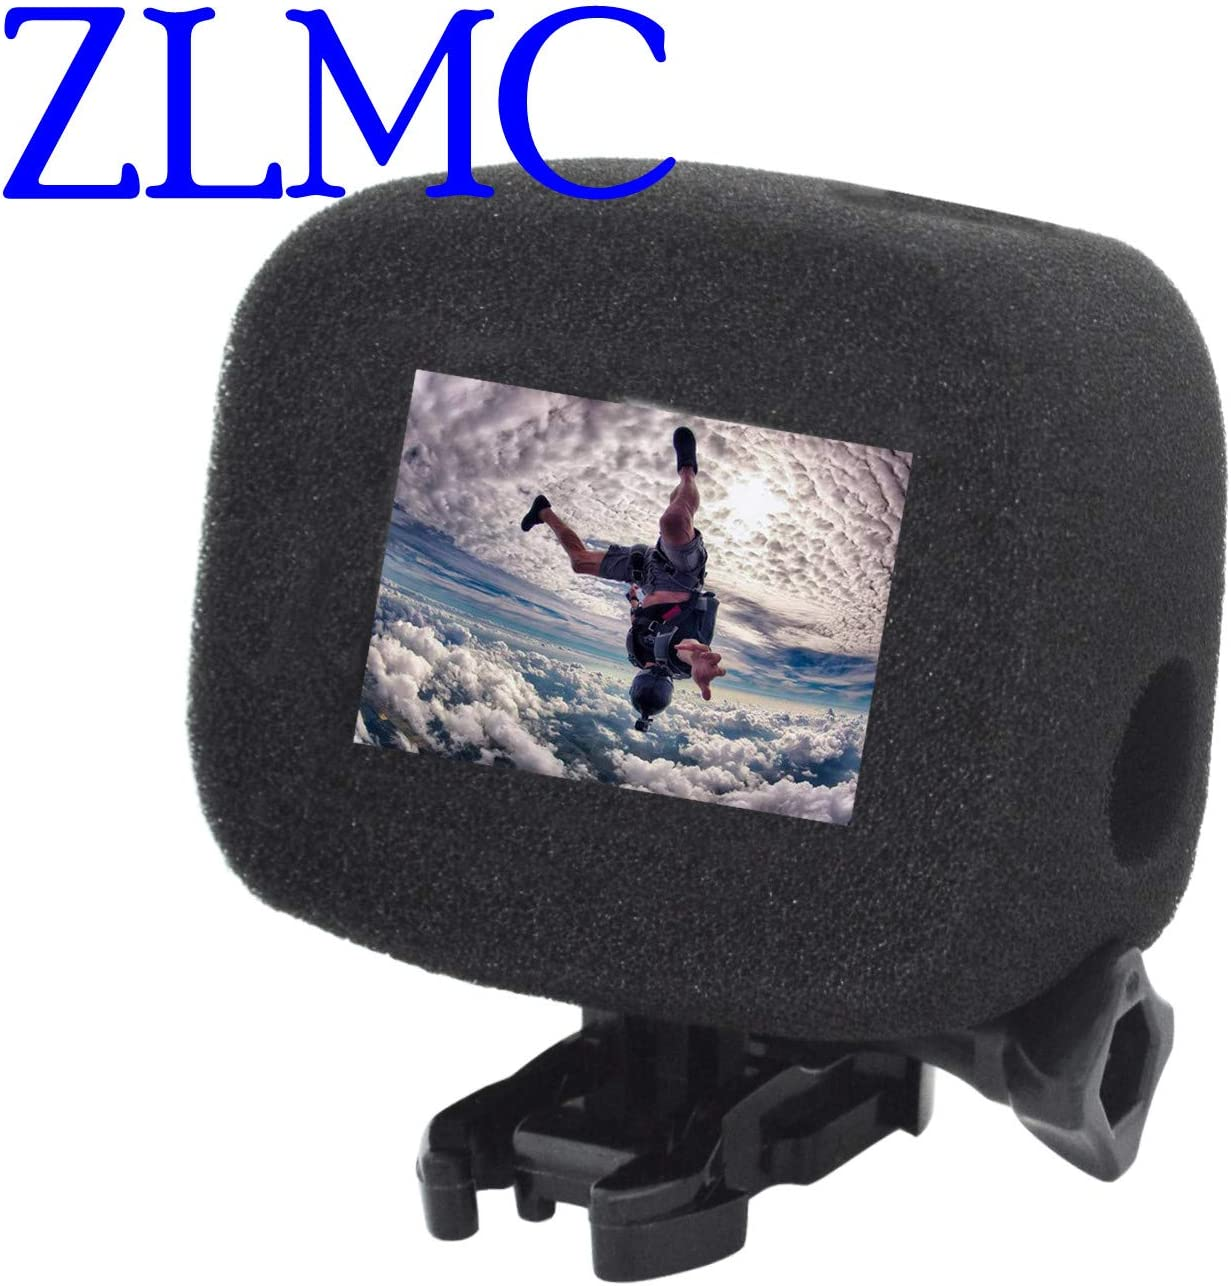 ZLMC Foam Windslayer windscreen Case for GoPro Hero 5 6 7 Black Camera Windshield Wind Housing Cover for Hero6 Hero5 Hero7 Audio Recording /& Protective Batteries Storage Boxes Holder